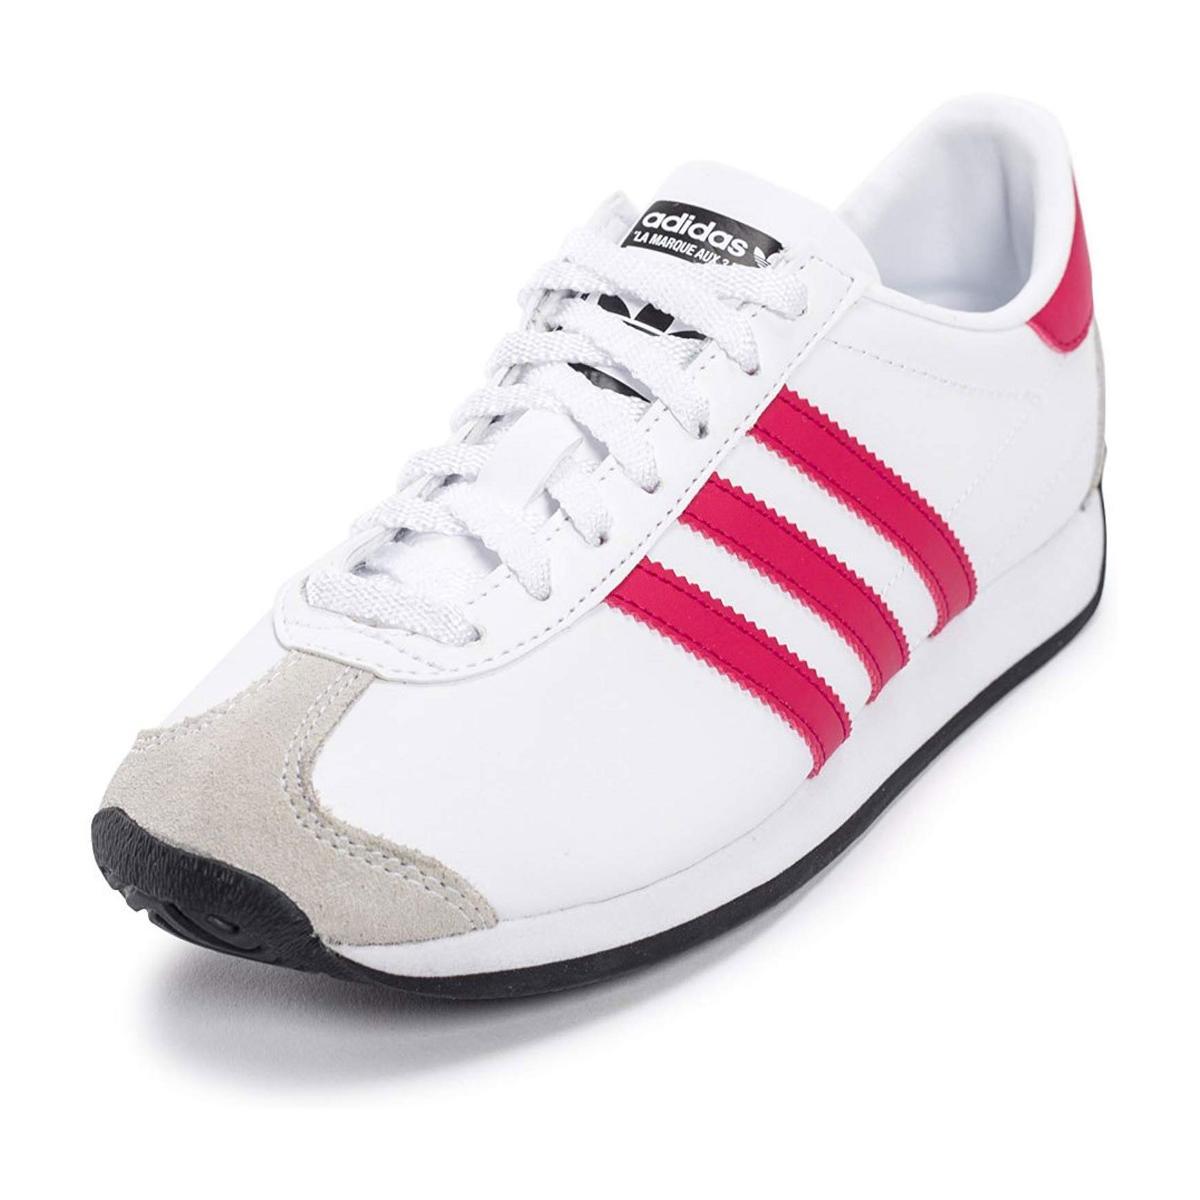 Scarpe Sneakers Adidas Country Og J da ragazza rif. S80228